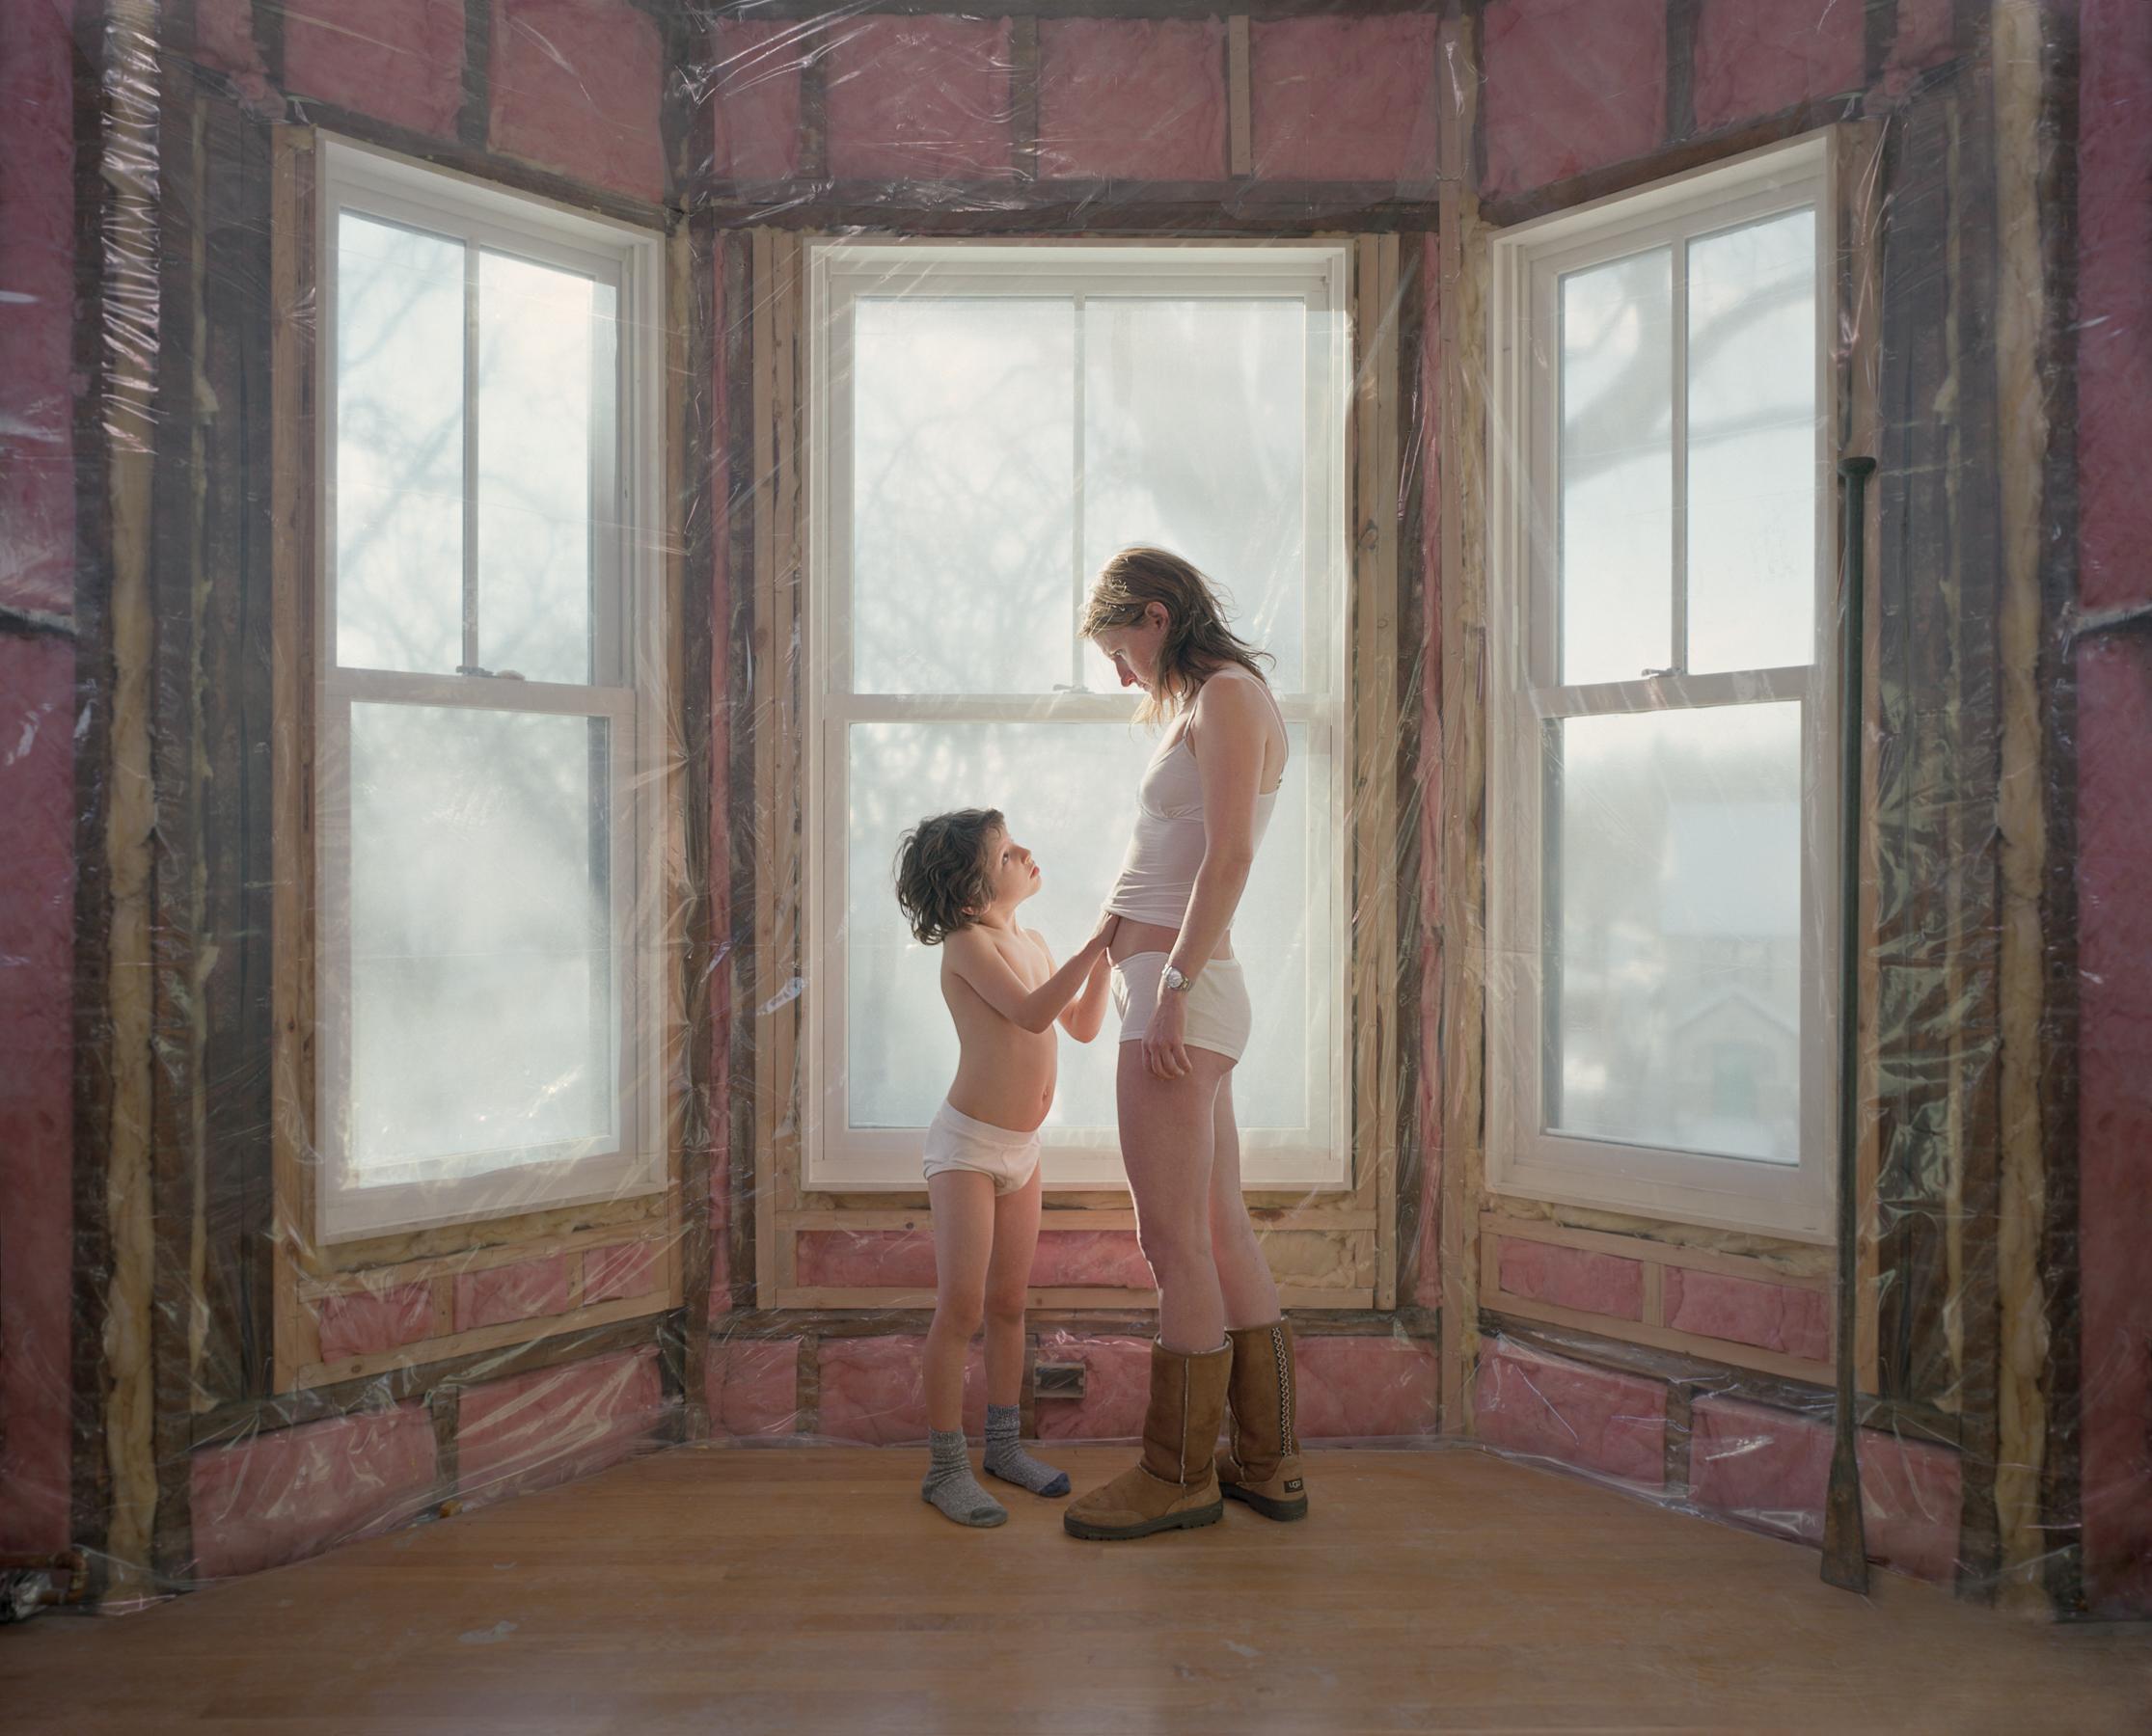 Lucien & Katherine, 2005